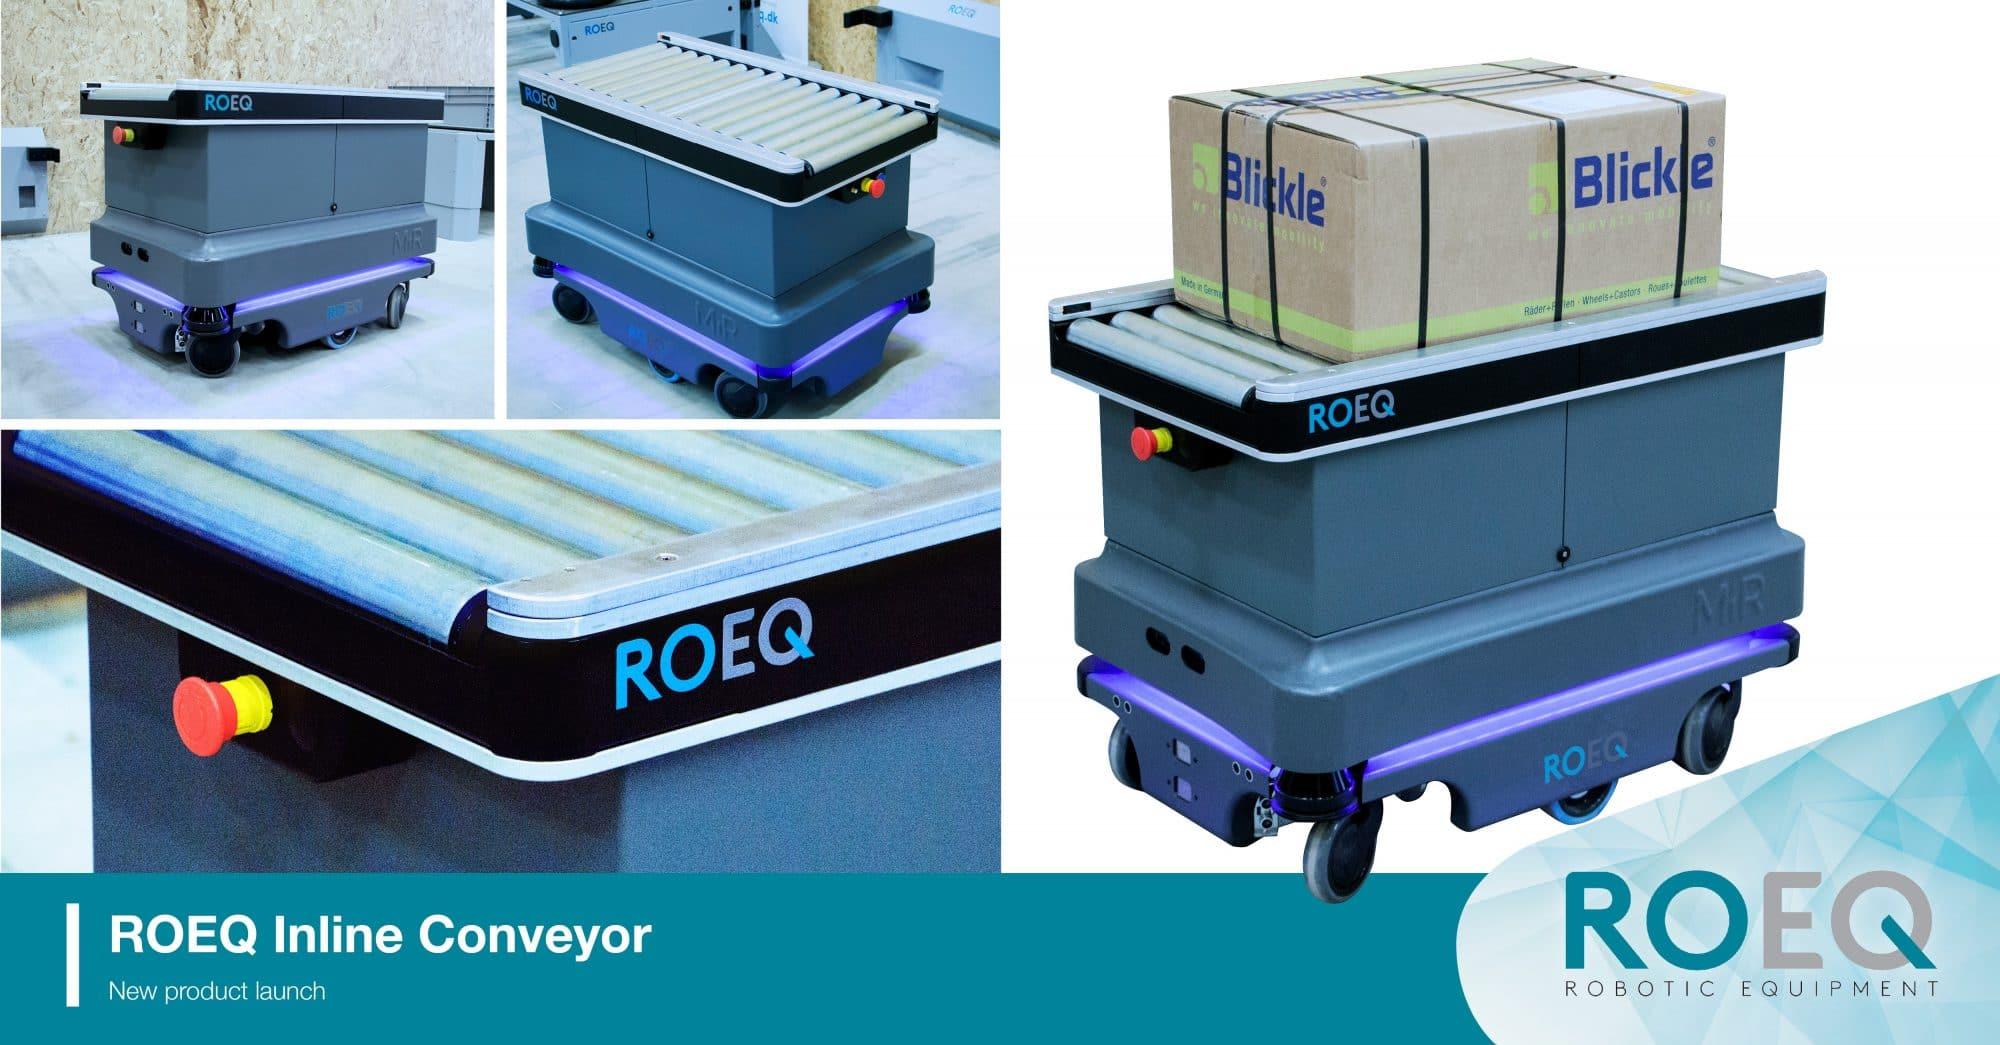 ROEQ Inline Conveyor